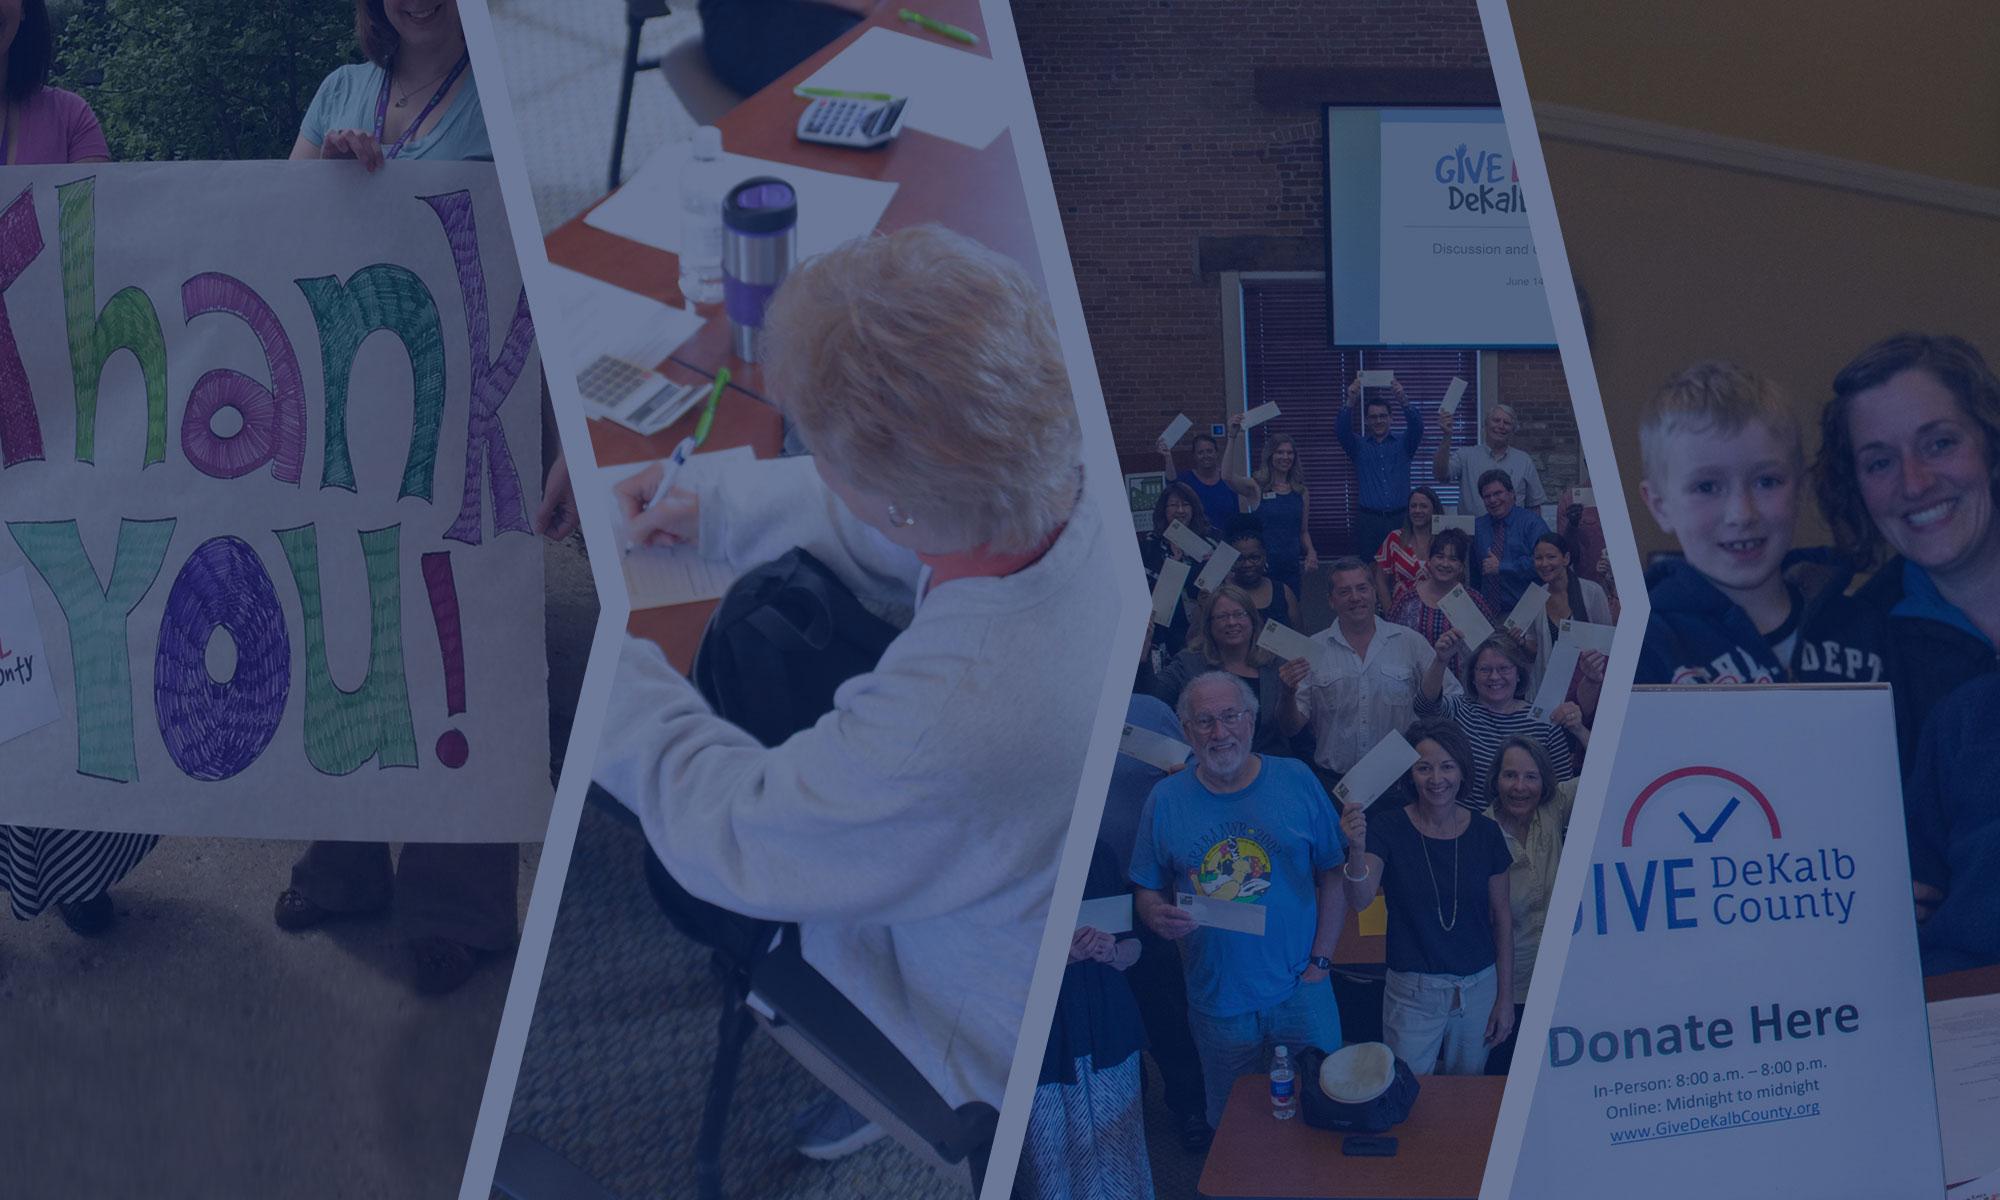 Give DeKalb County, DeKalb County Community Foundation